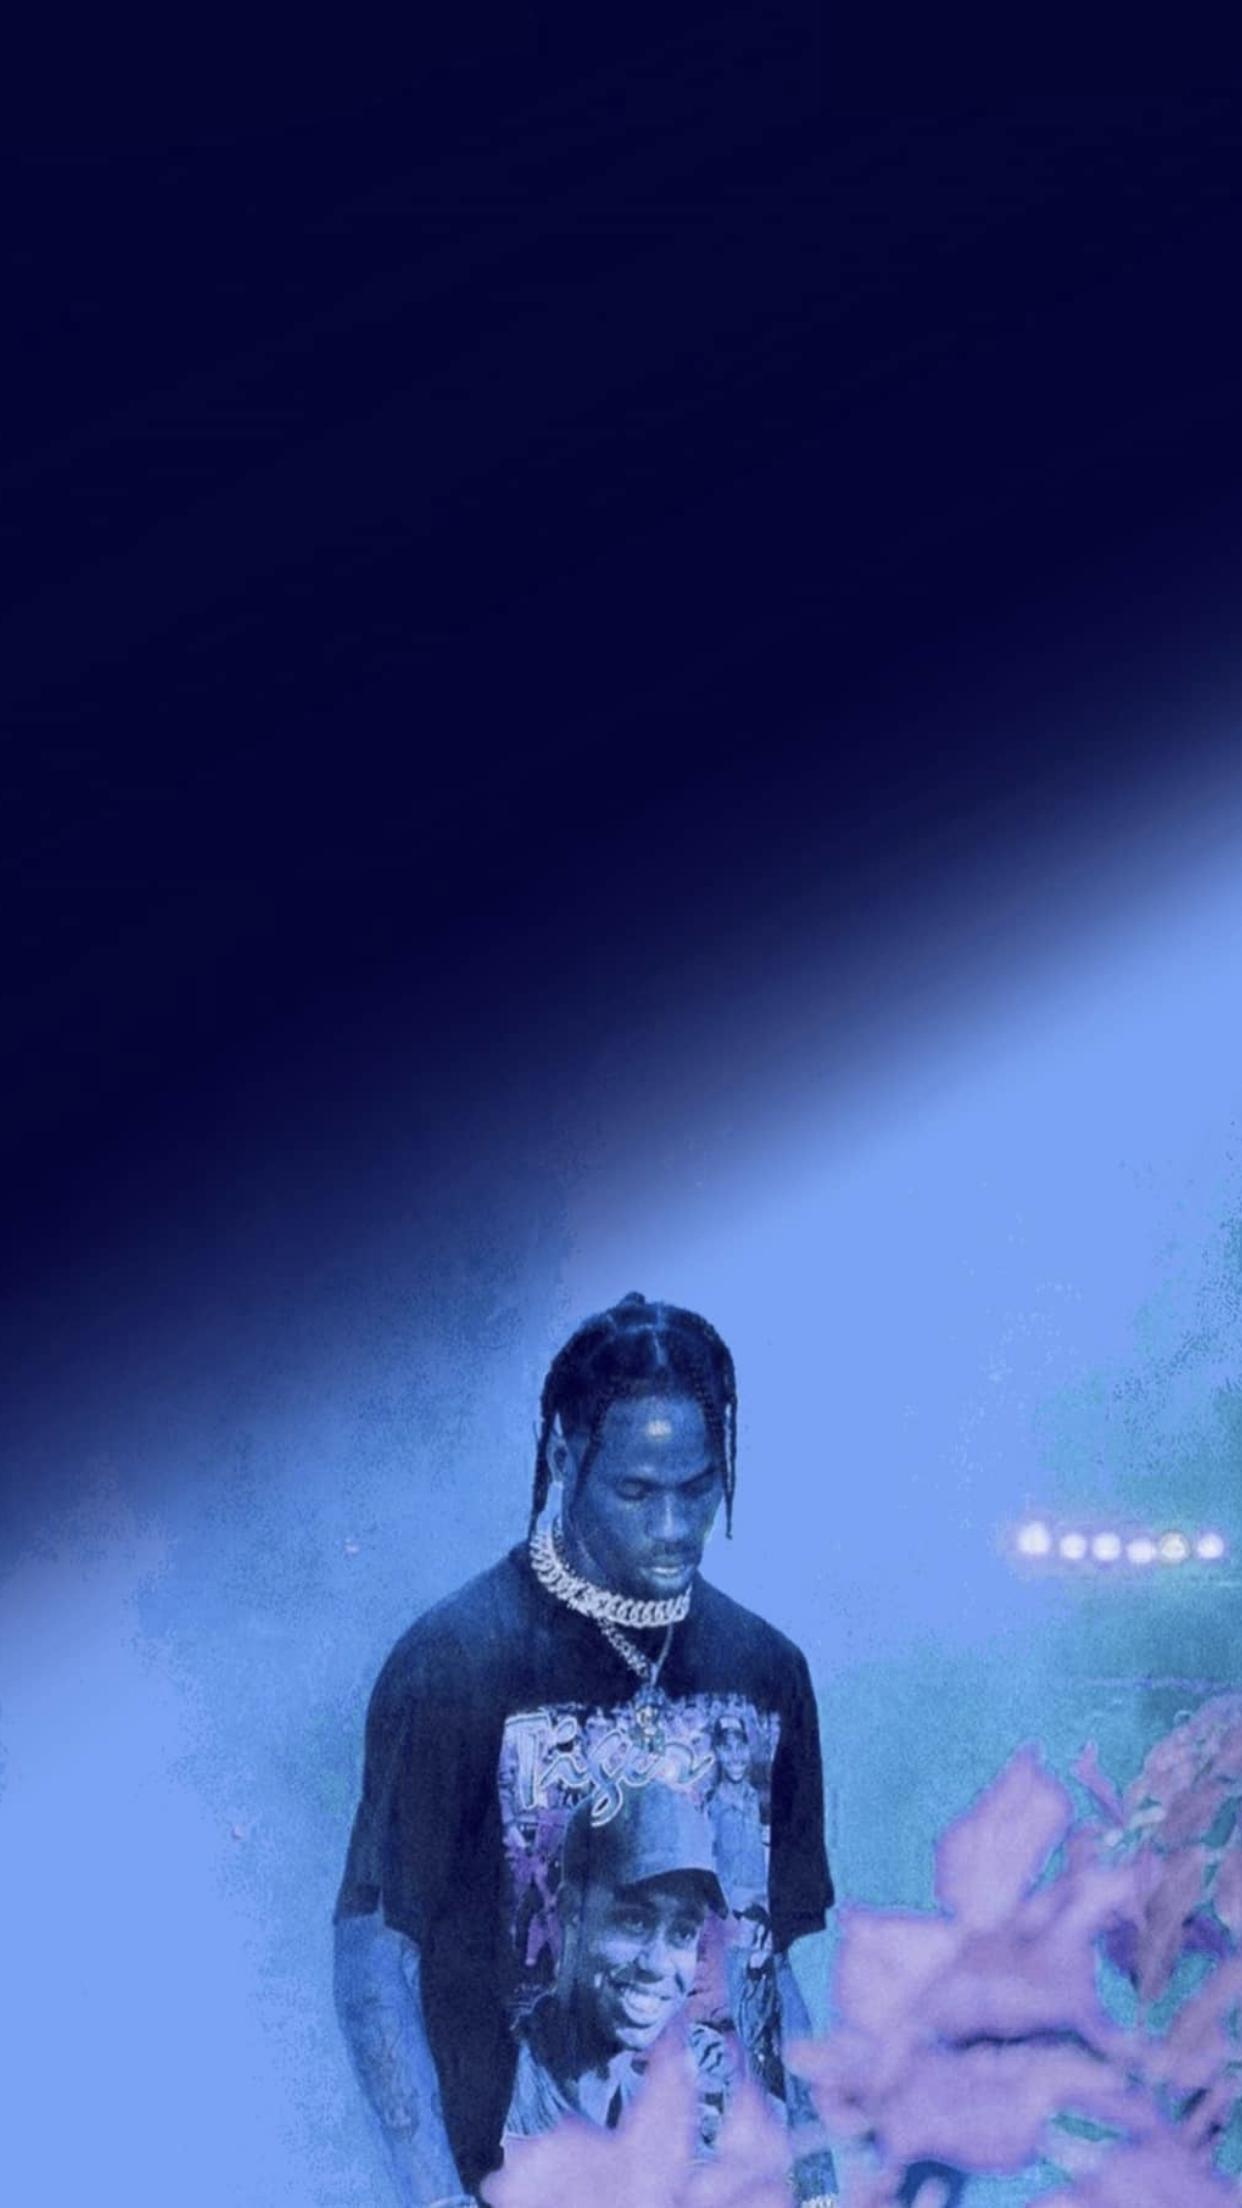 Travis Scott In 2020 Travis Scott Wallpapers Blue Aesthetic Color In Film